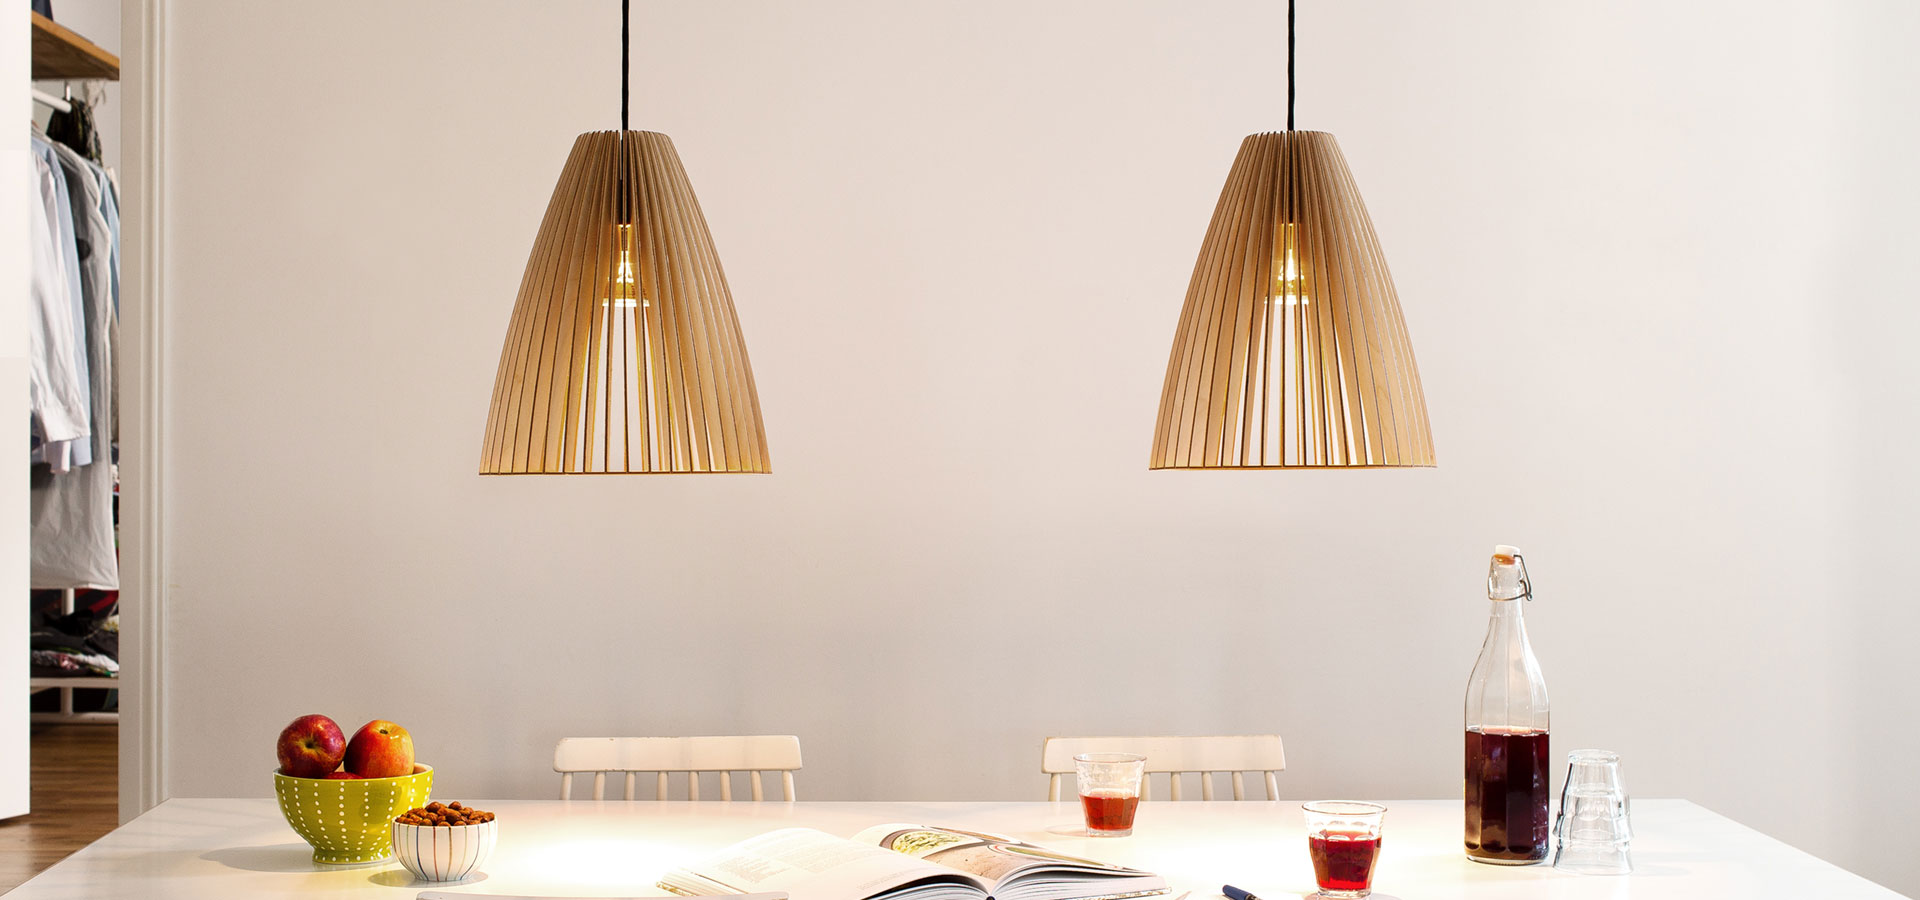 PENDELLEUCHTE-TEIA–HOLZ-LAMPE-BIRKE-NATUR-1920×900